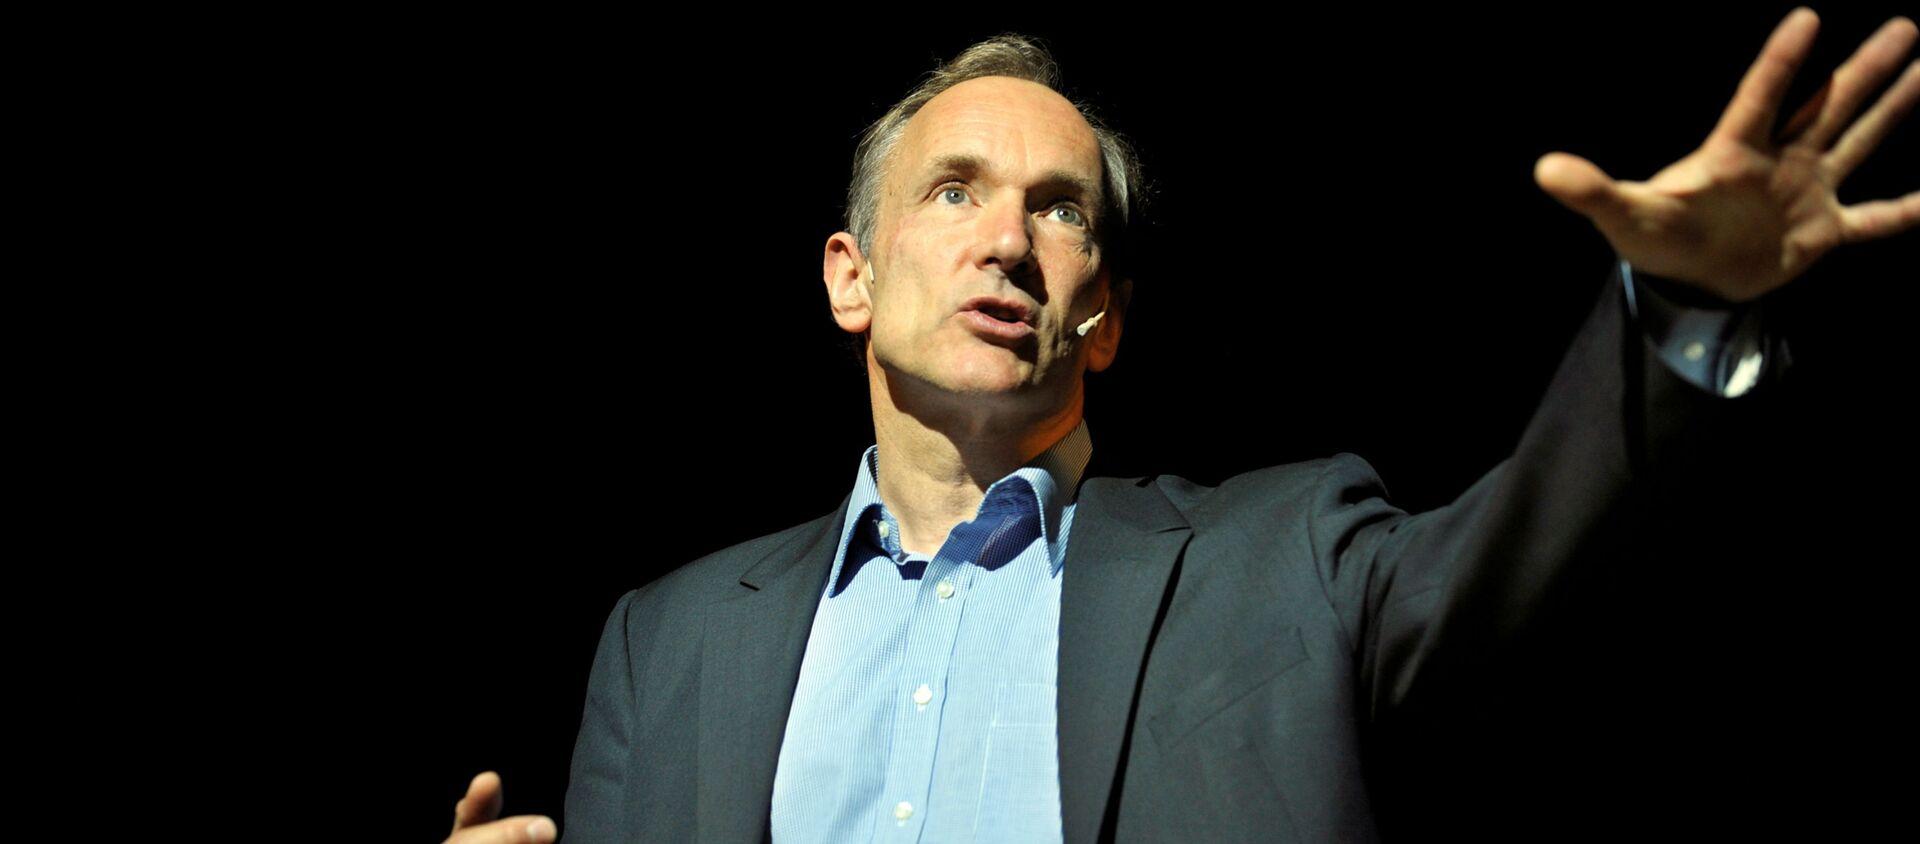 FILE PHOTO: World Wide Web founder Tim Berners-Lee delivers a speech at the Bilbao Web Summit in the Palacio Euskalduna May 17, 2011. REUTERS/Vincent West/File Photo - Sputnik Türkiye, 1920, 15.06.2021